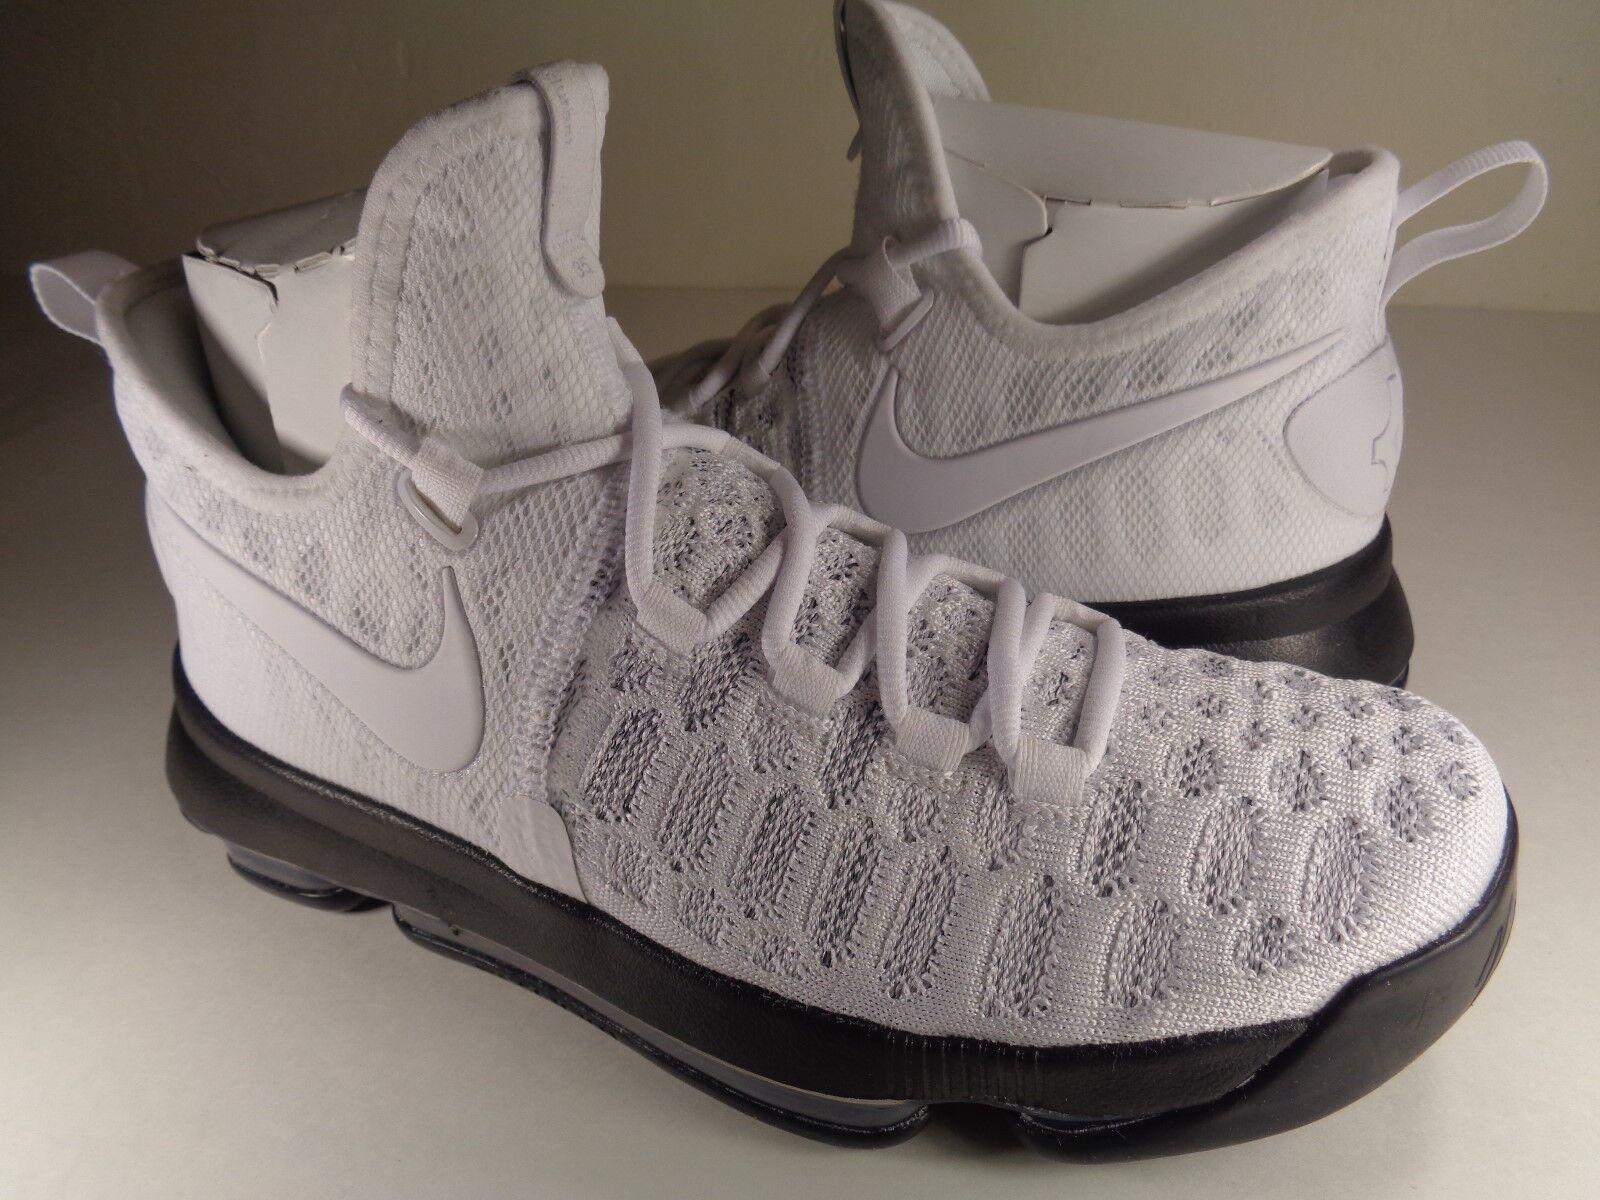 Nike Zoom KD 9 iD White Black SZ 7 // Womens 8.5 (863695-992)